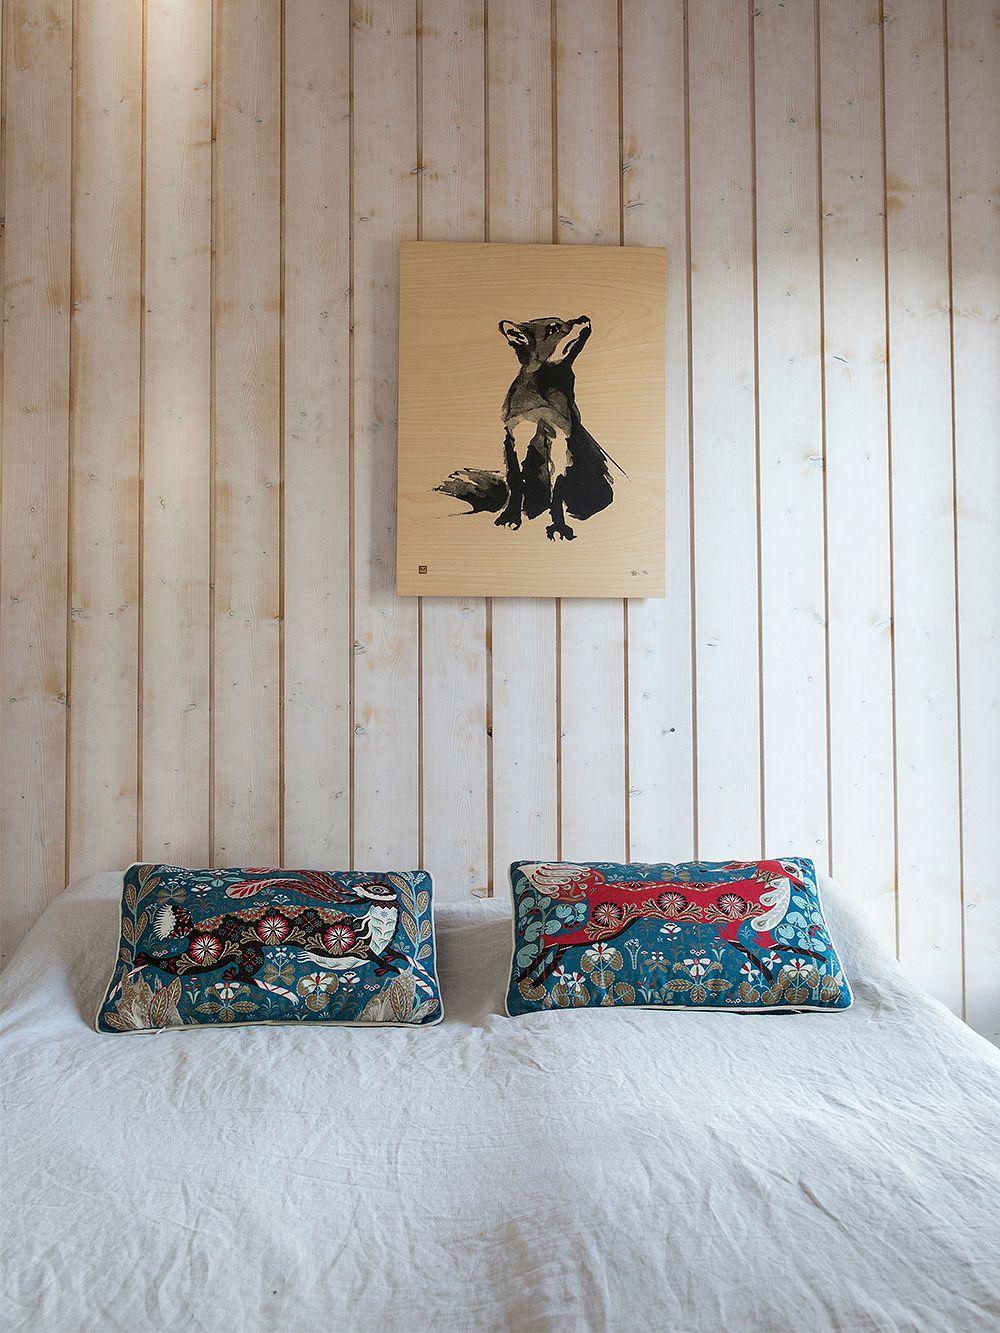 Running Hare cushion cover, linen